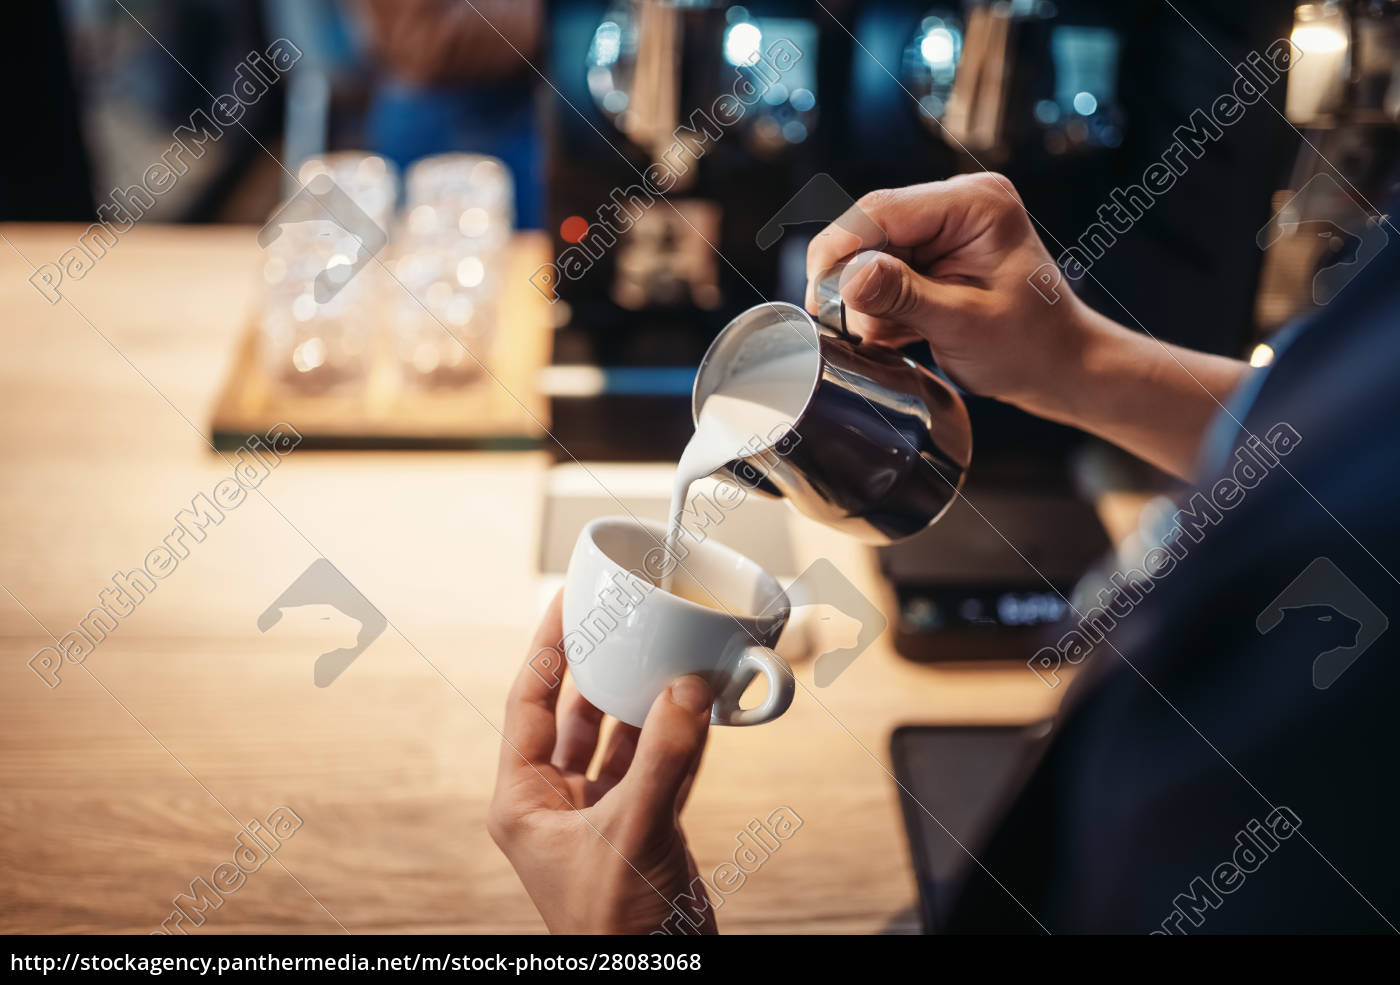 barista, hand, pours, cream, into, the - 28083068